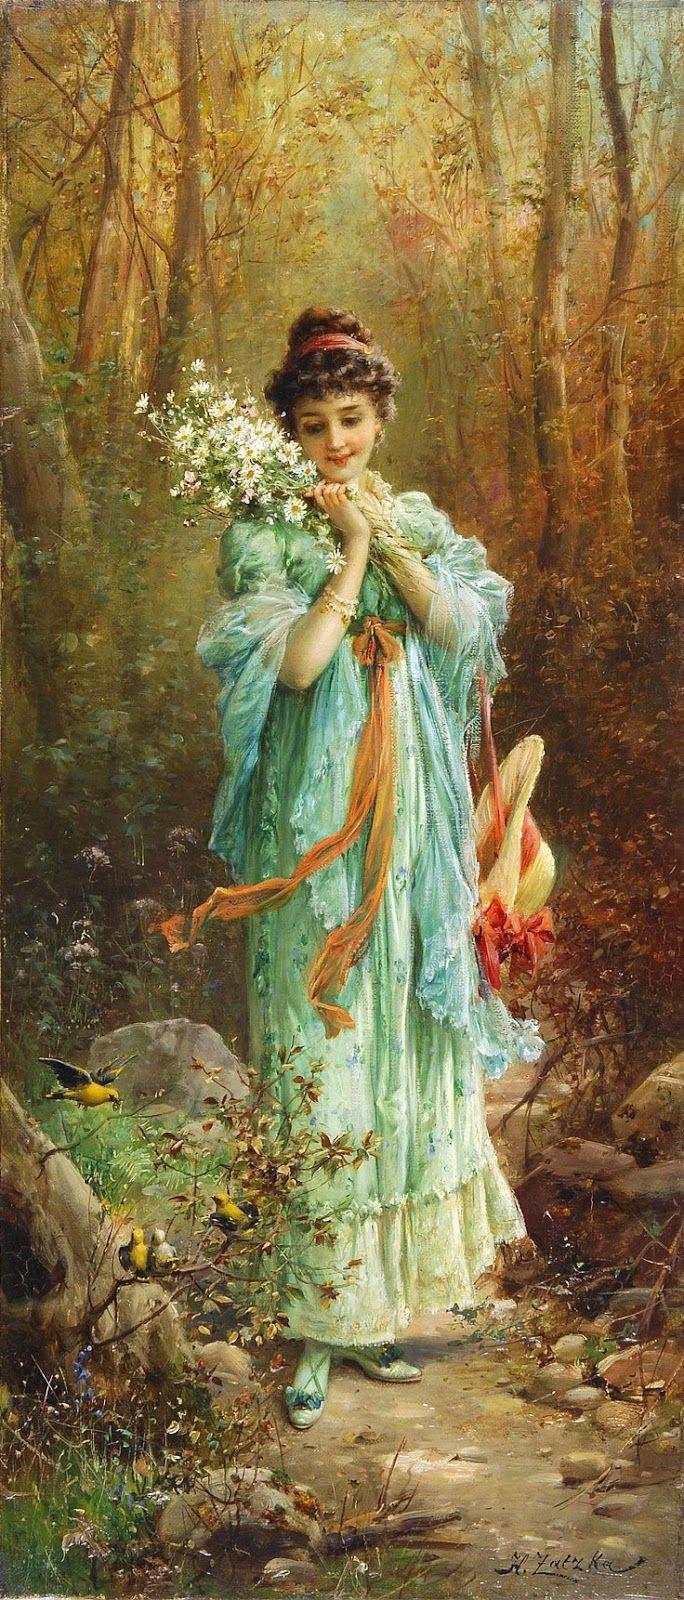 Hans Zatzka - Alpine Flowers.     Hans Zatzka - Cupid's Whisper     Hans Zatzka - Nymphs     Hans Zatzka - Fairy Dance.     Hans Zatzka -...